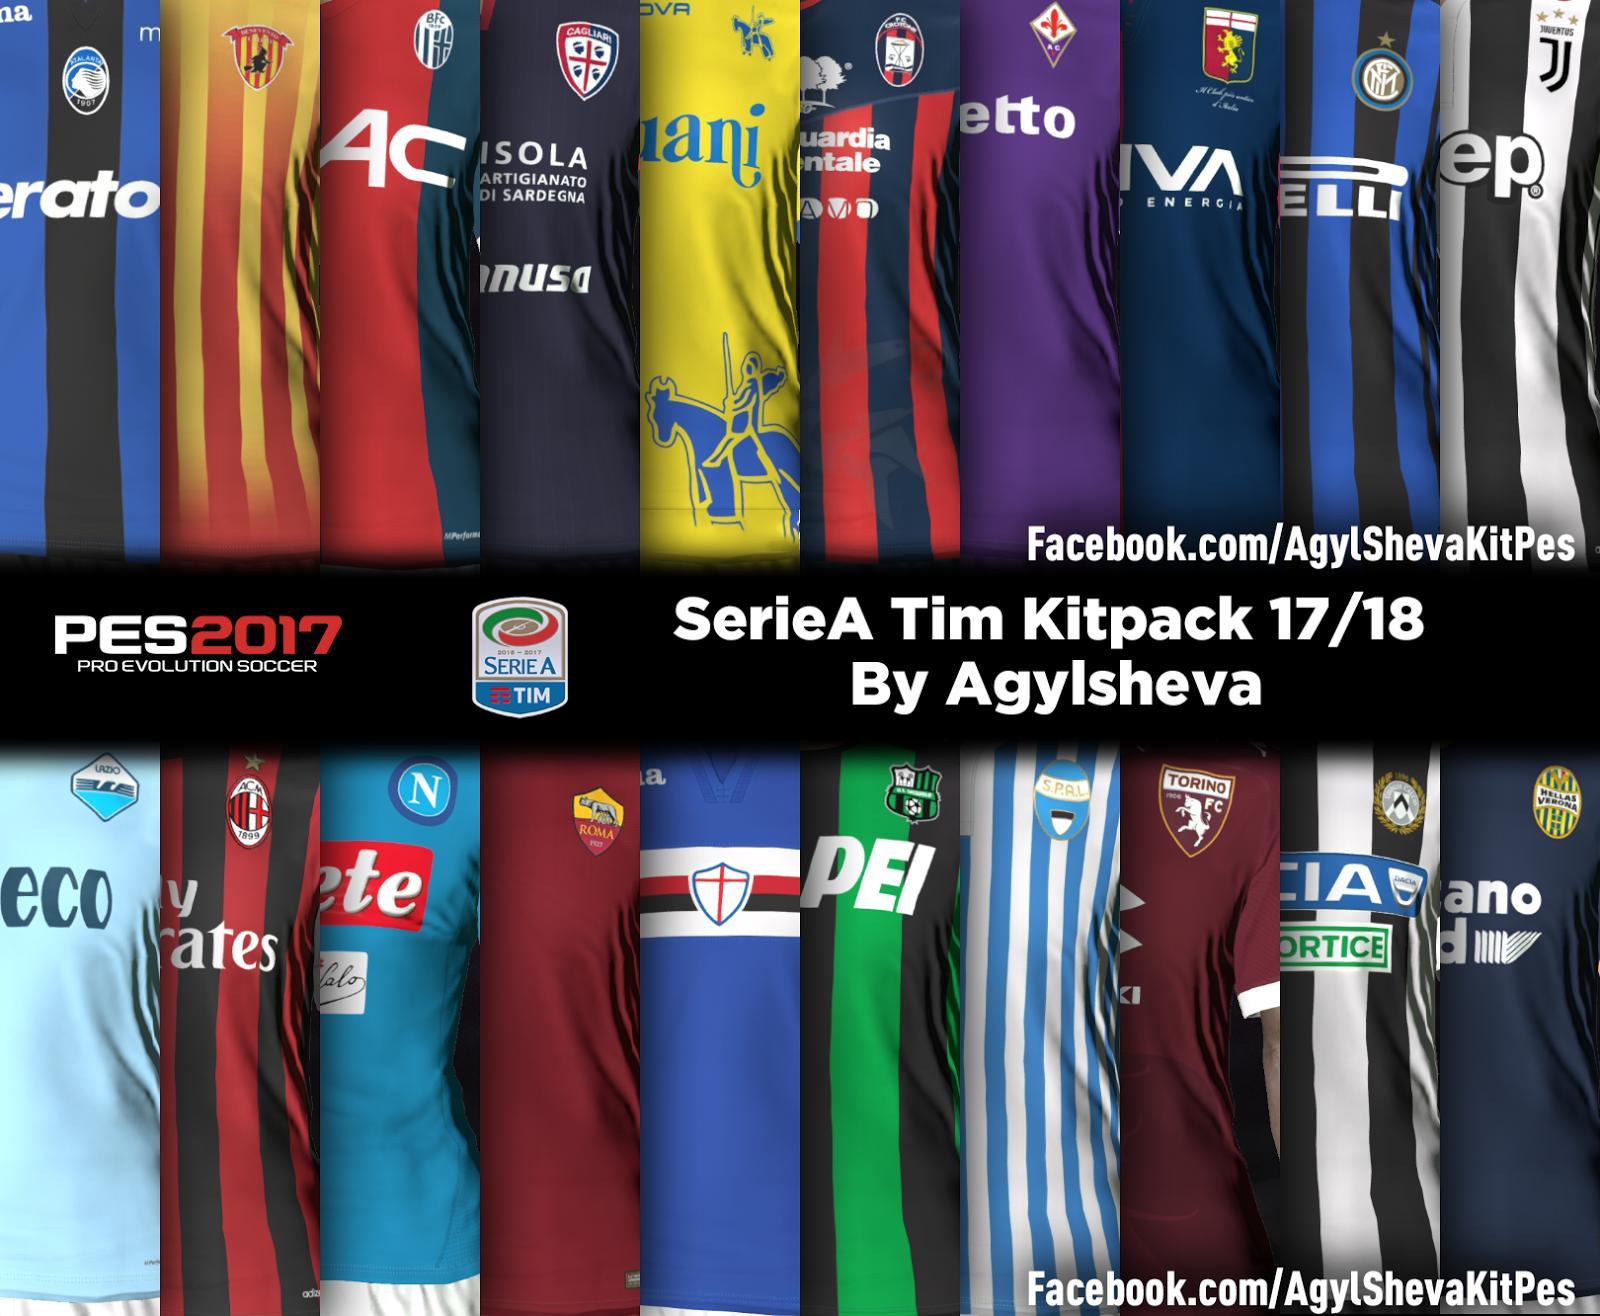 SerieA Kitpack 17/18 PES 2017 By Agylsheva